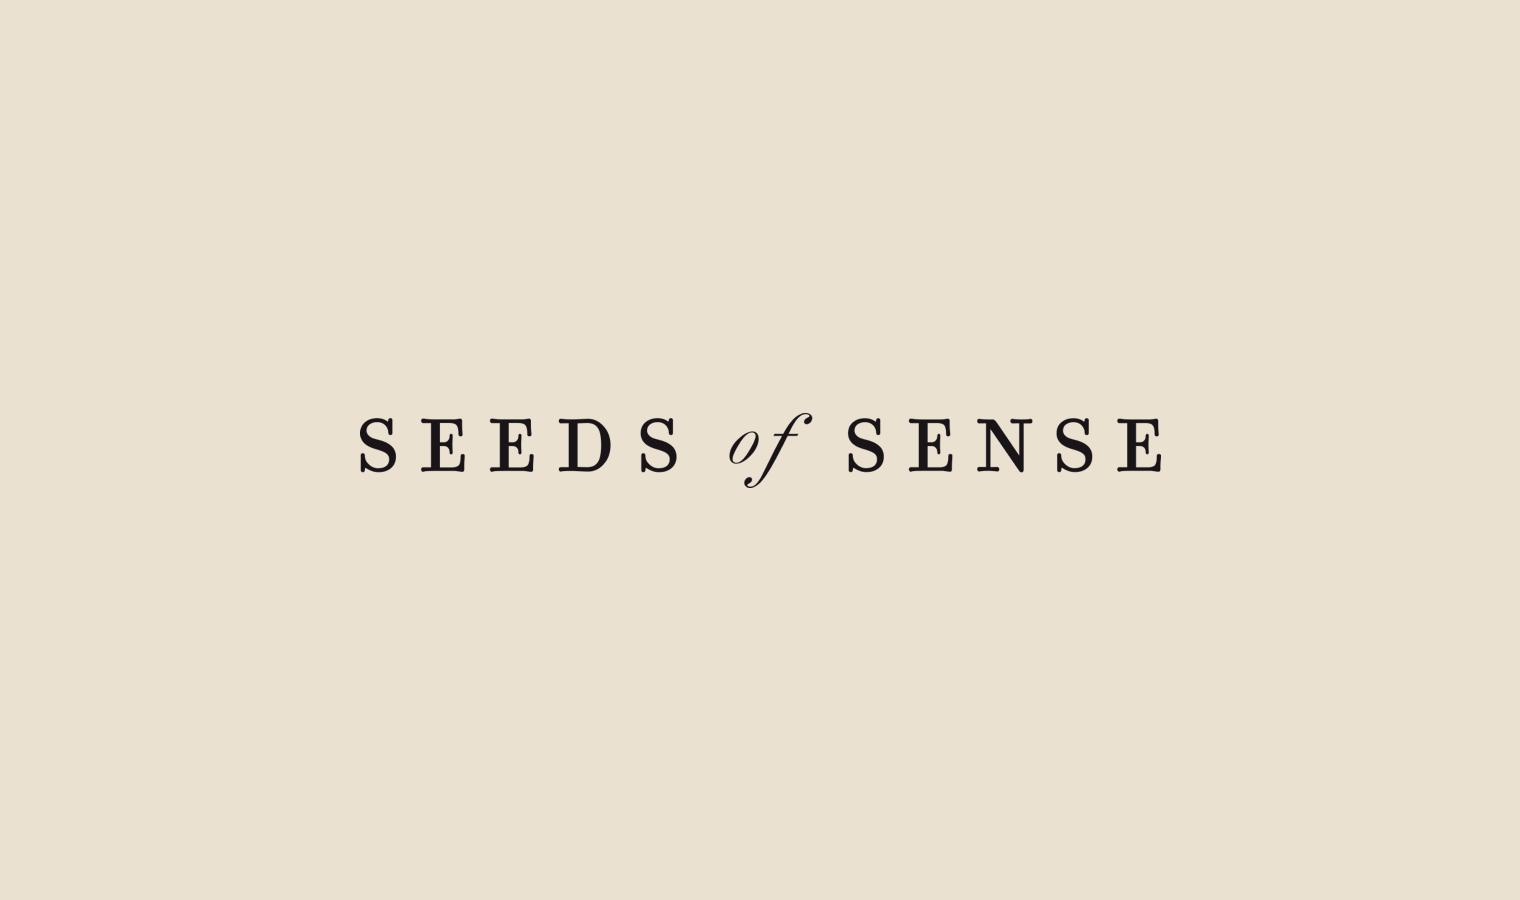 Seeds-of-Sense-Sustainable-Yoga-Wear-Branding-02.png